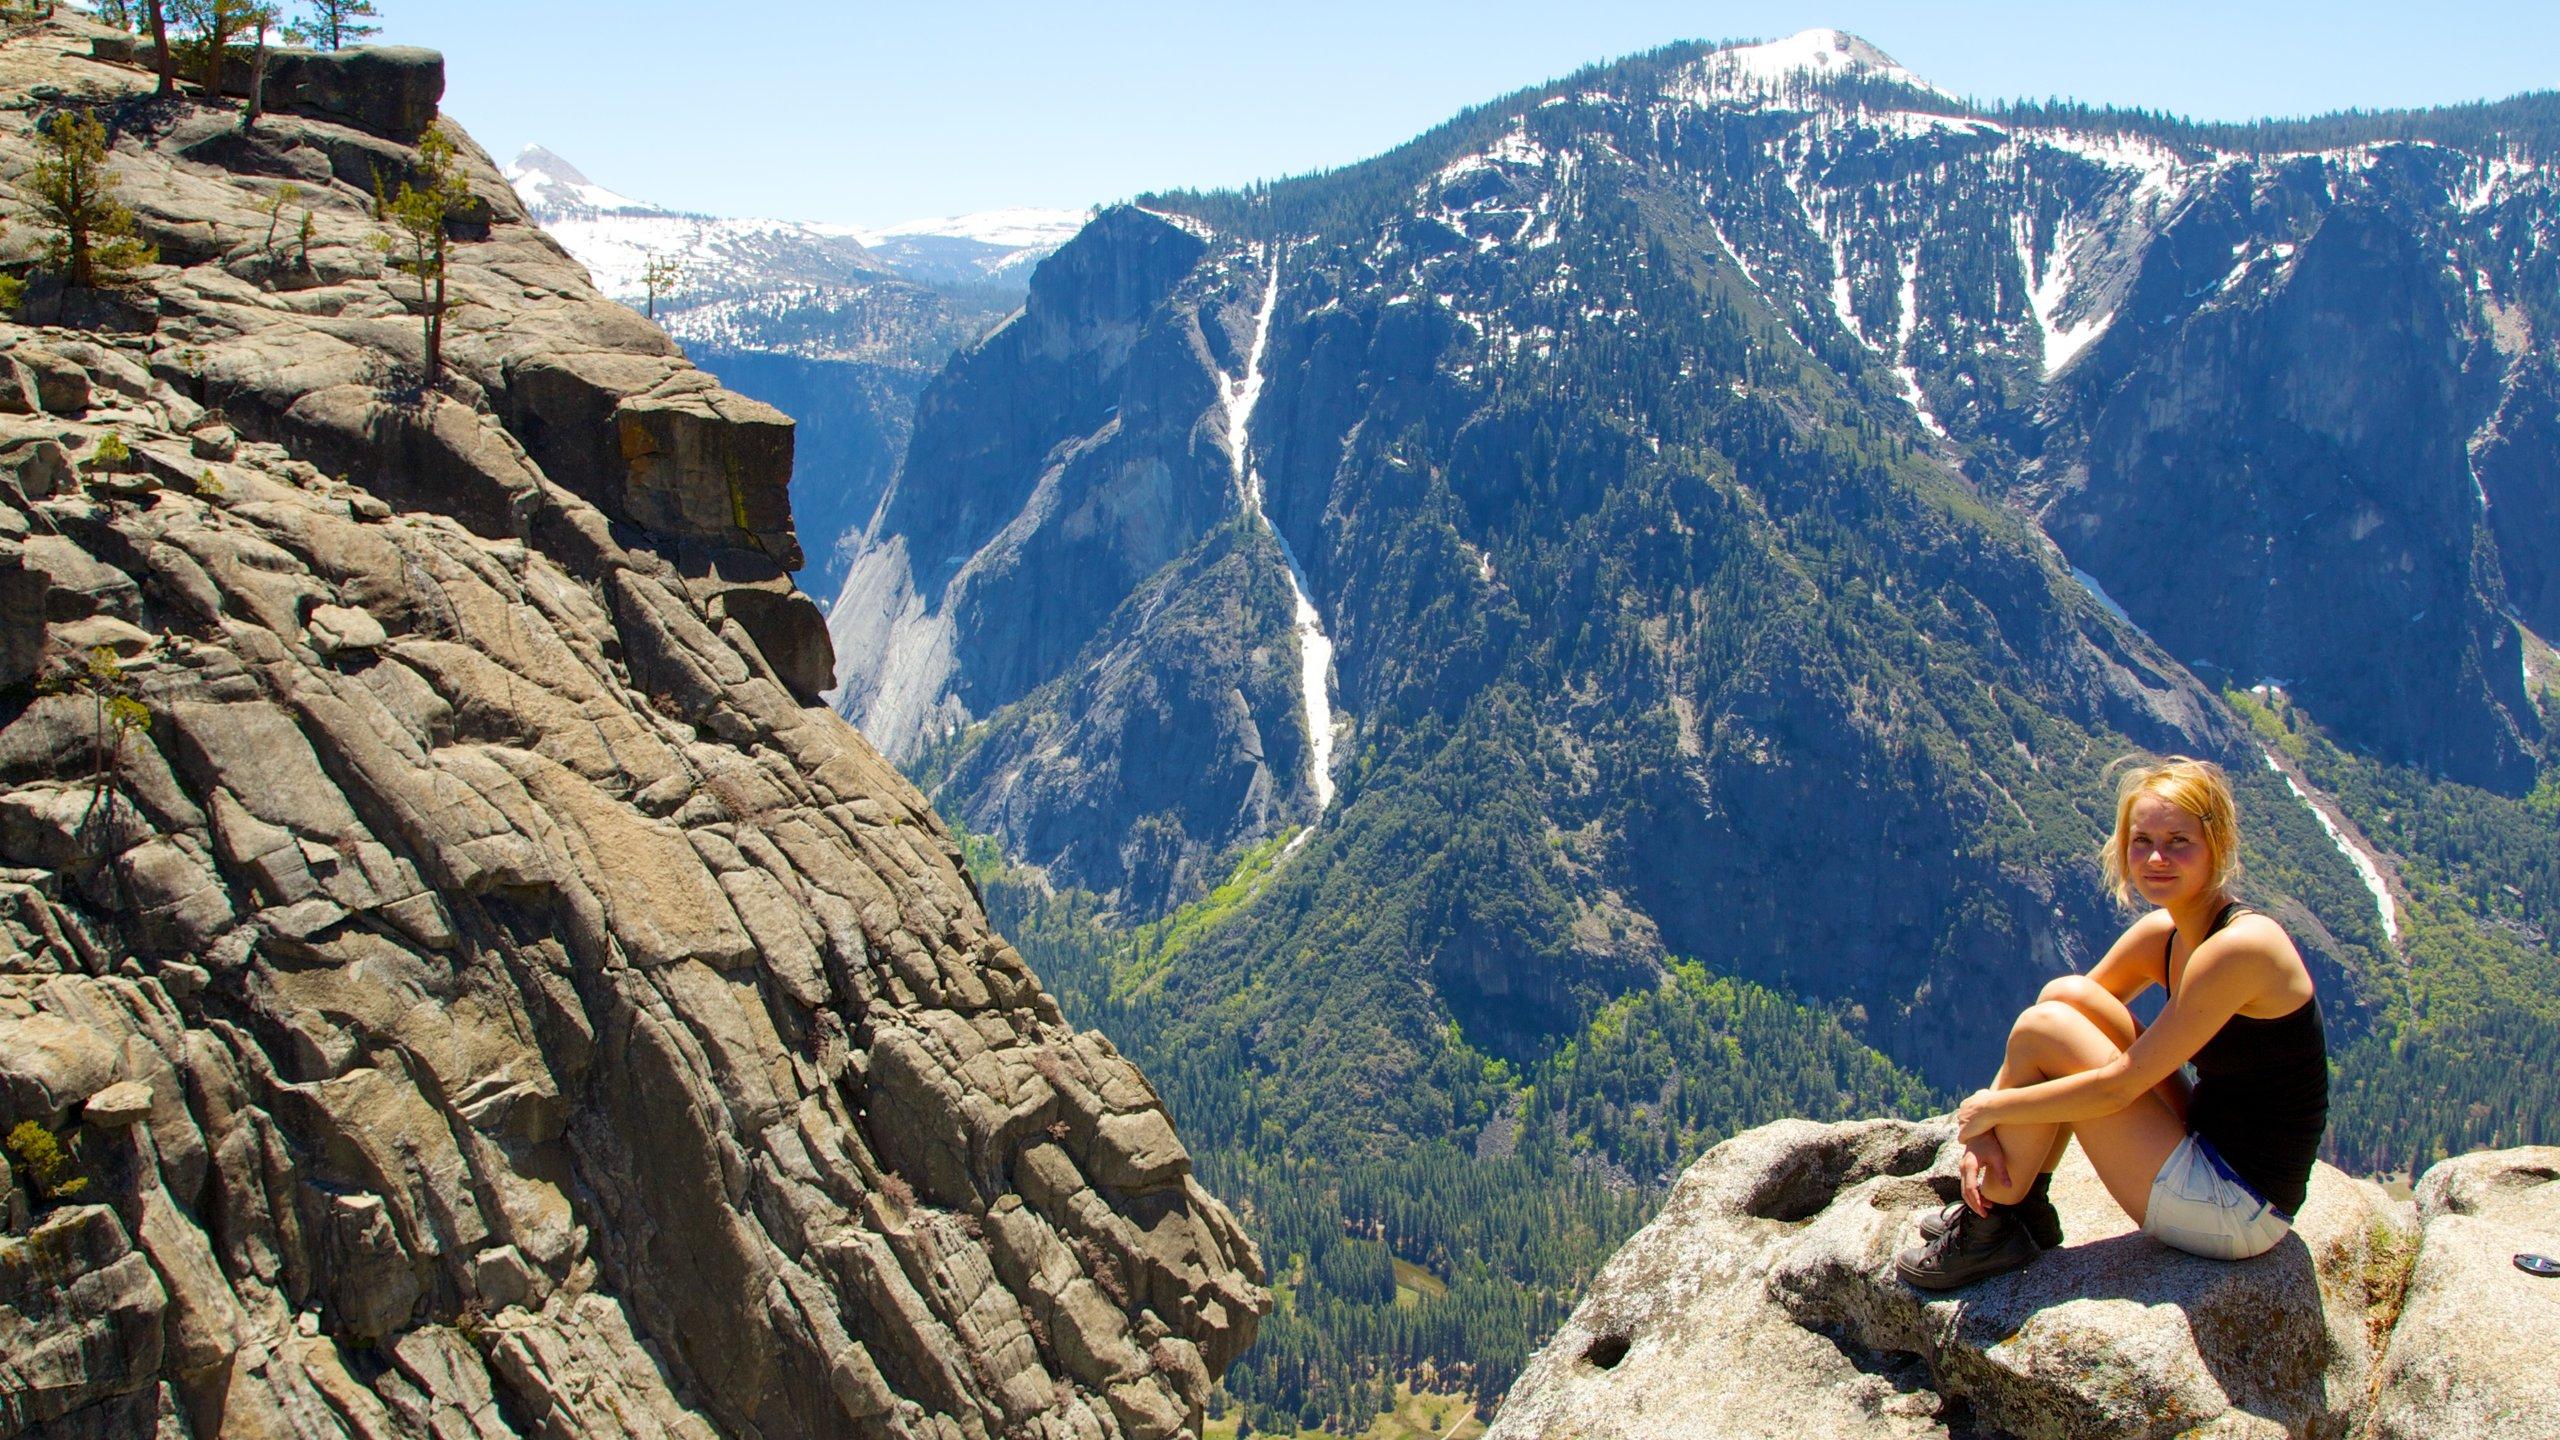 Top 10 Pet Friendly Hotels In Yosemite National Park, CA $69